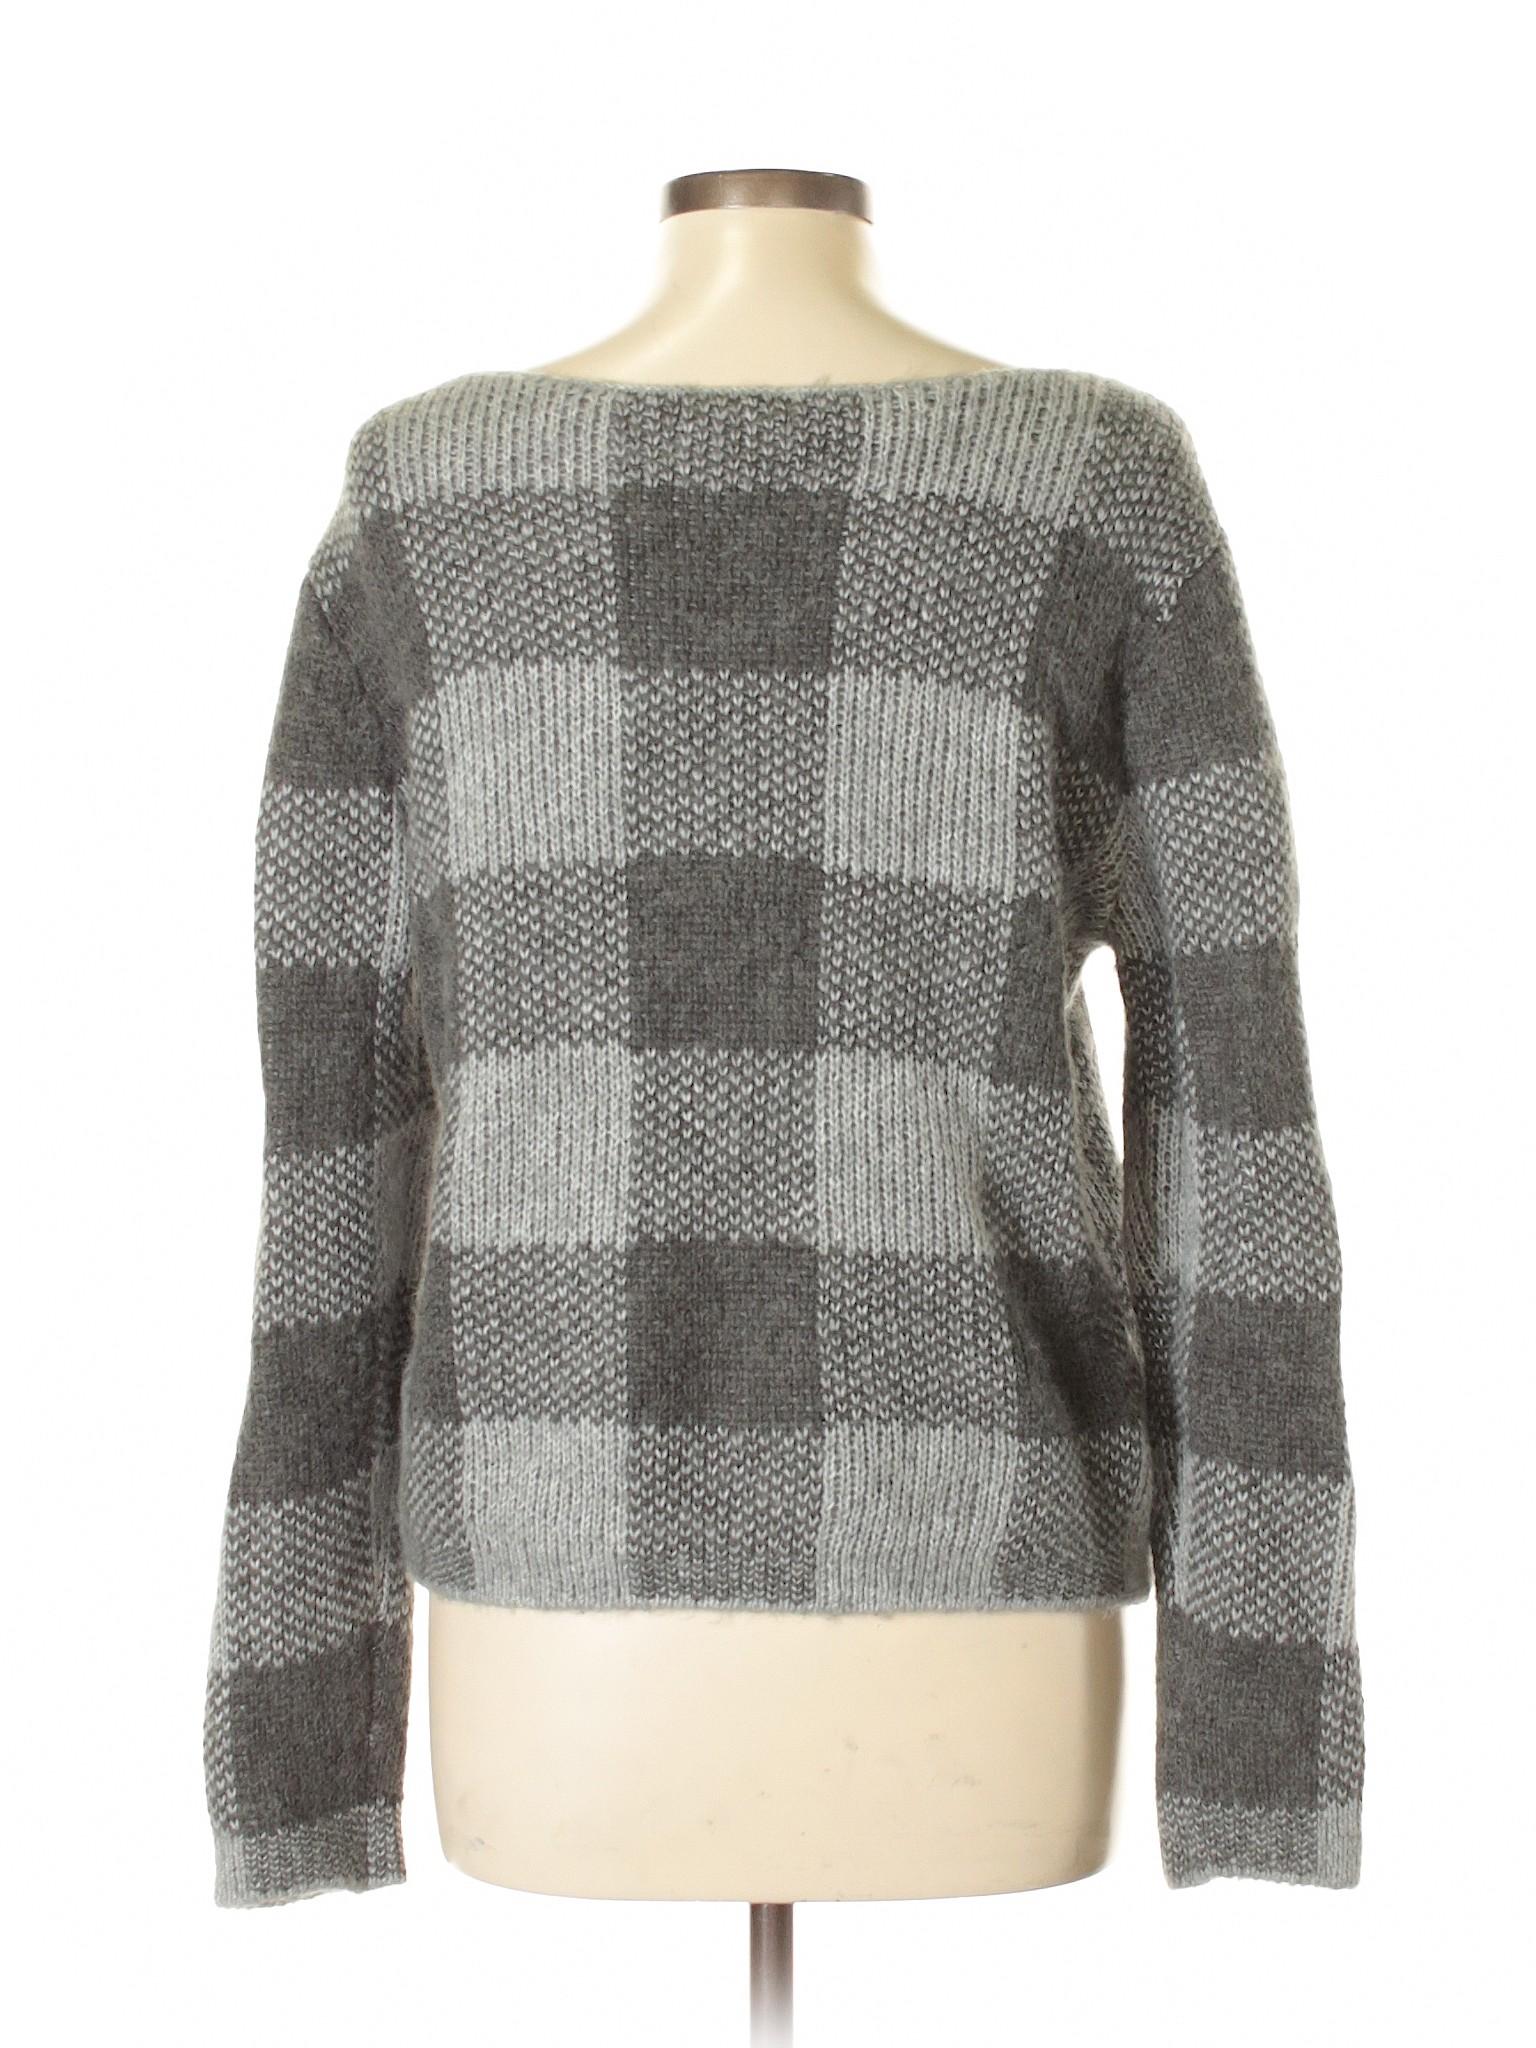 Outlet Gap Boutique Boutique Pullover Pullover Outlet Sweater Sweater Gap Gap Boutique Outlet Pullover xwFgnp0qA